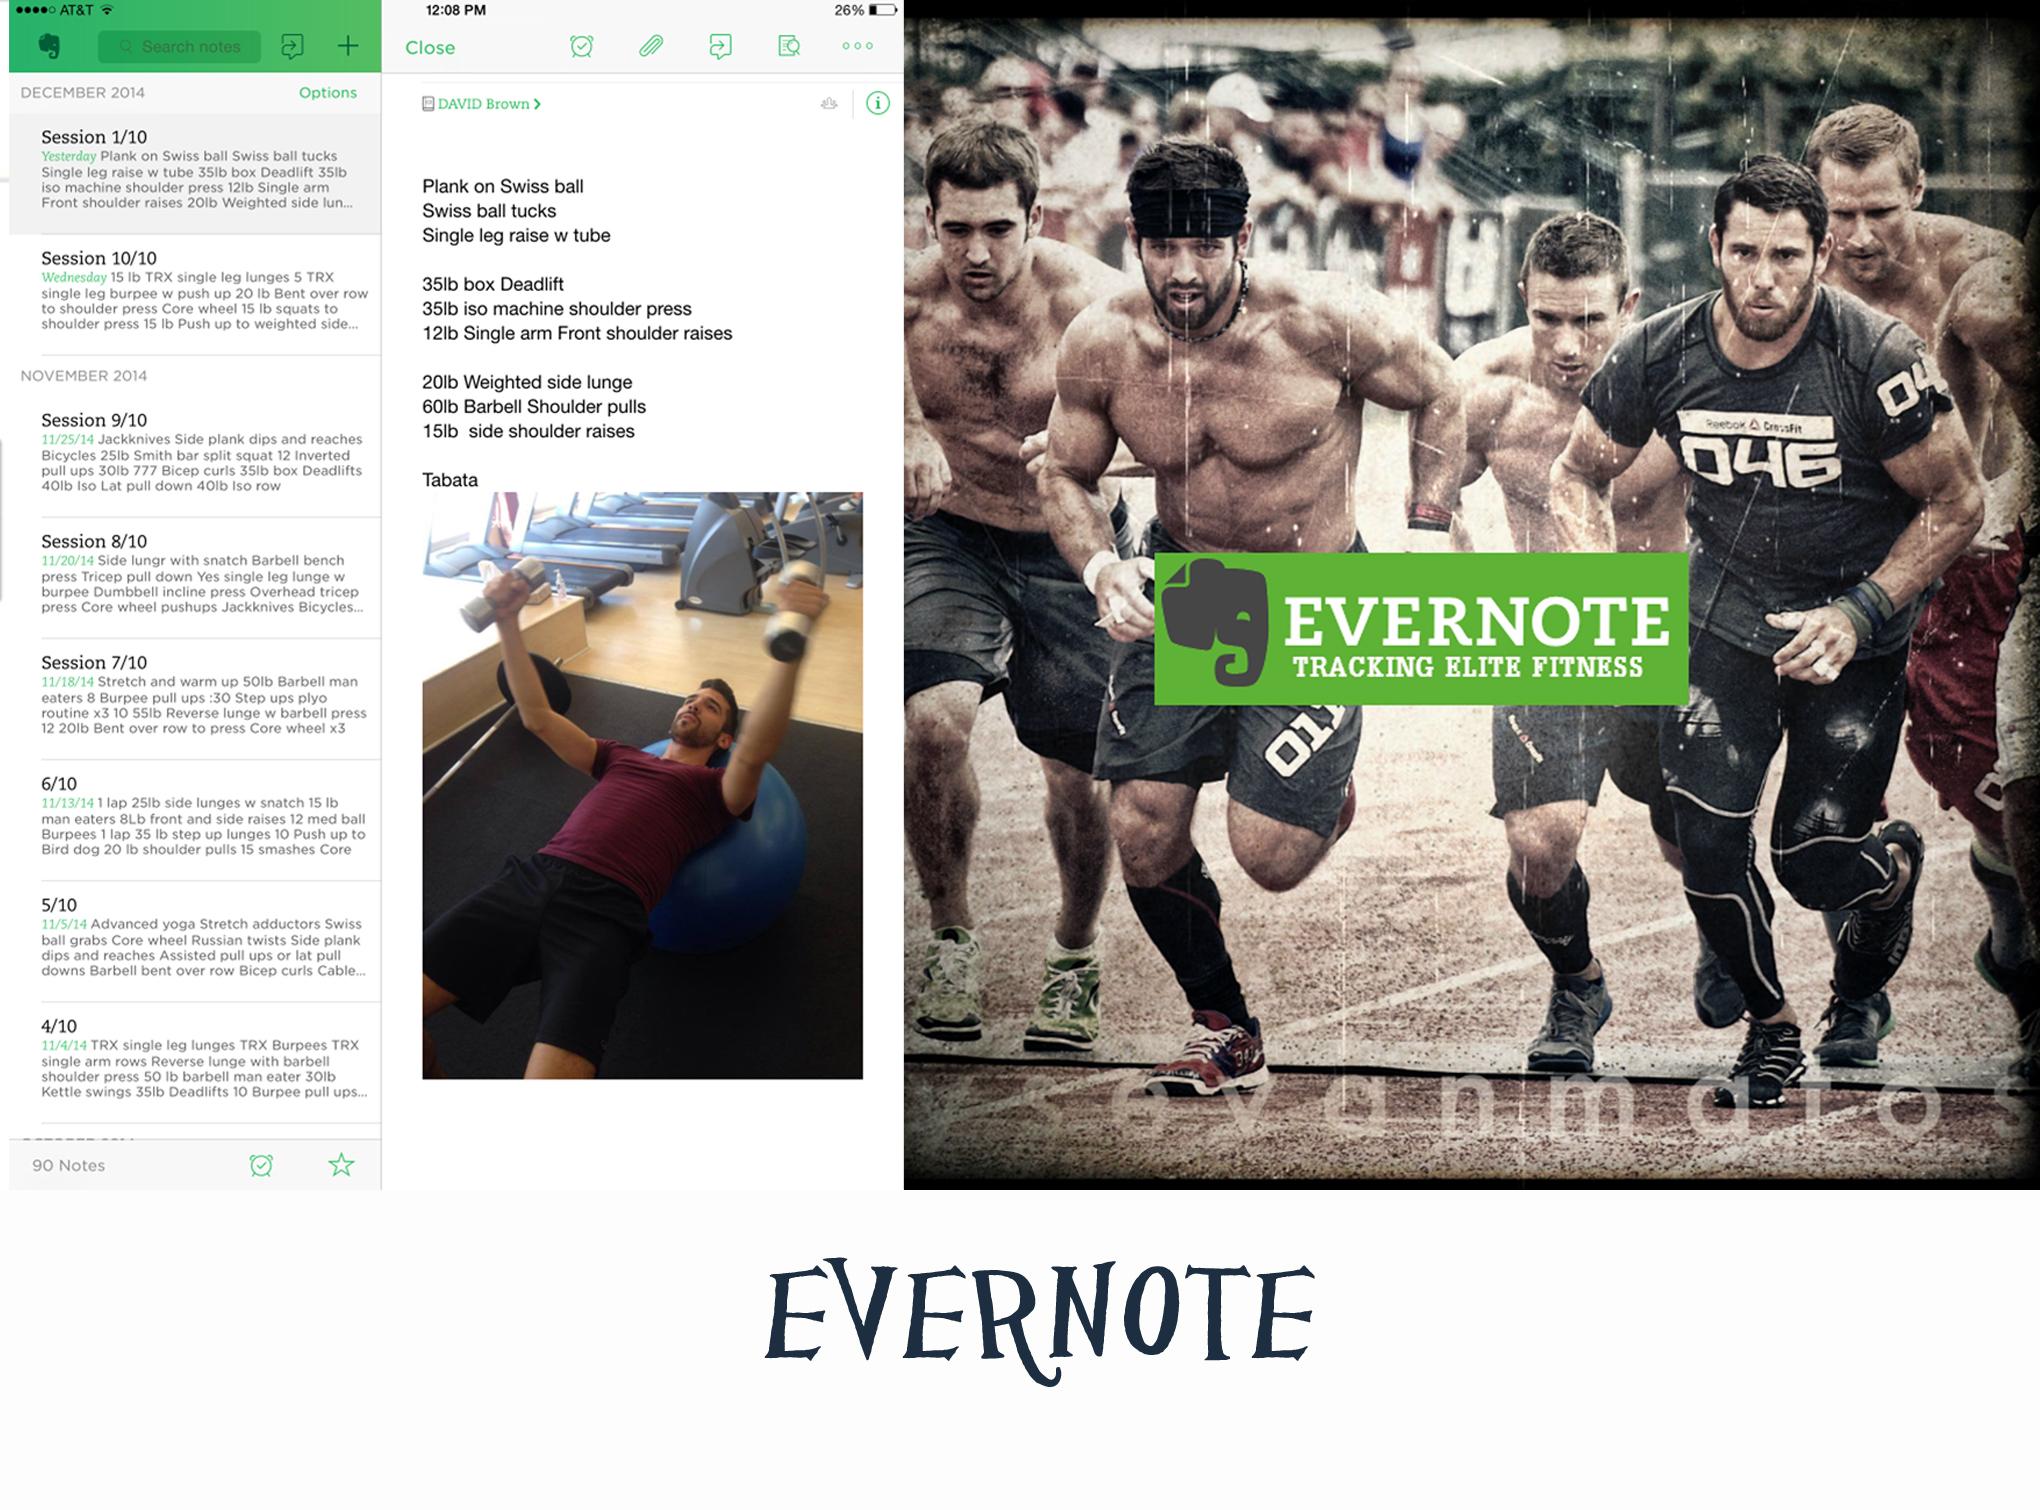 everynote12345